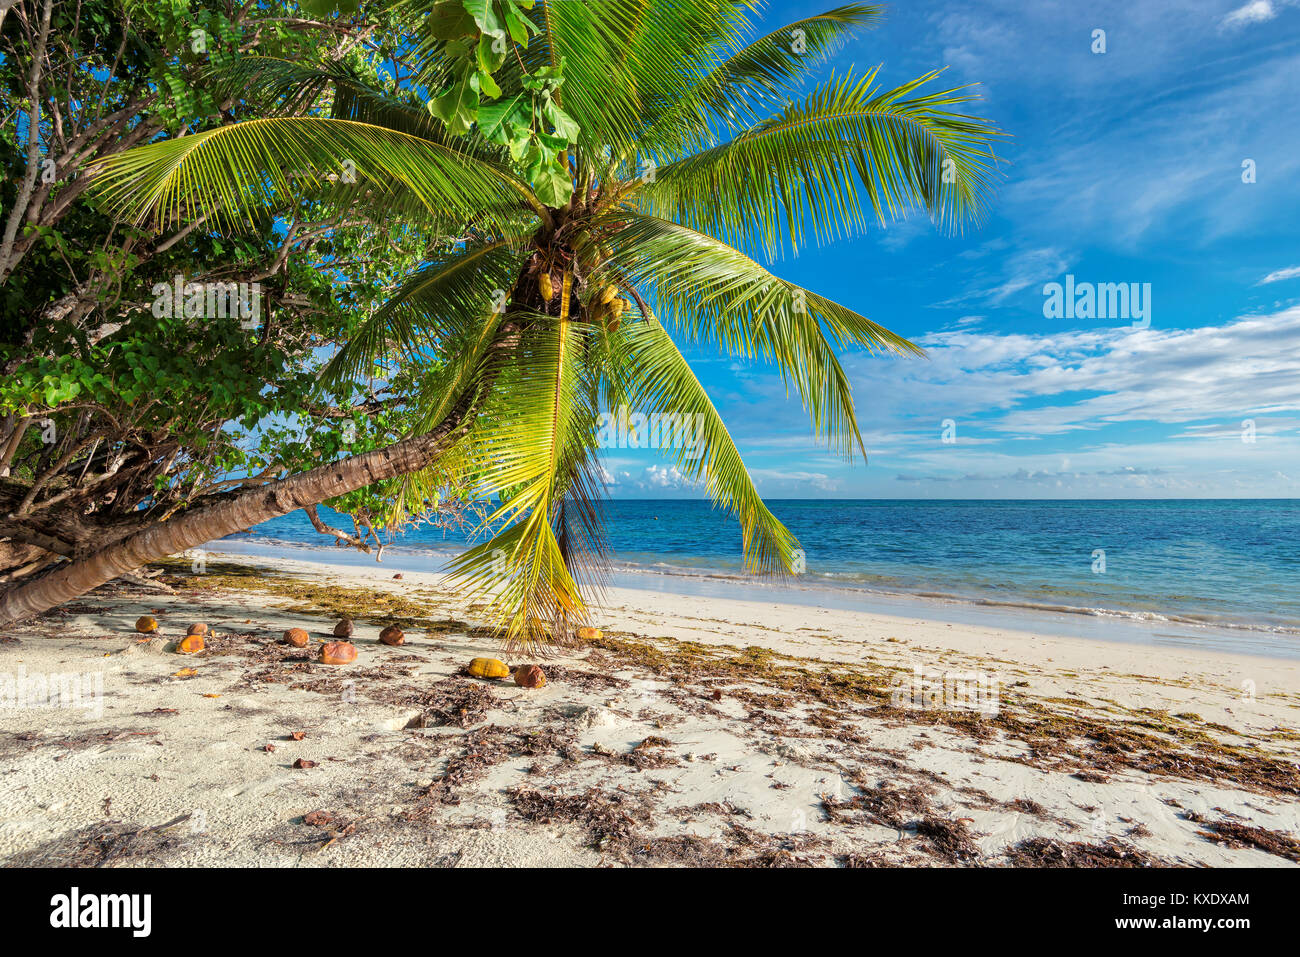 Playa tropical intocada en Seychelles Imagen De Stock